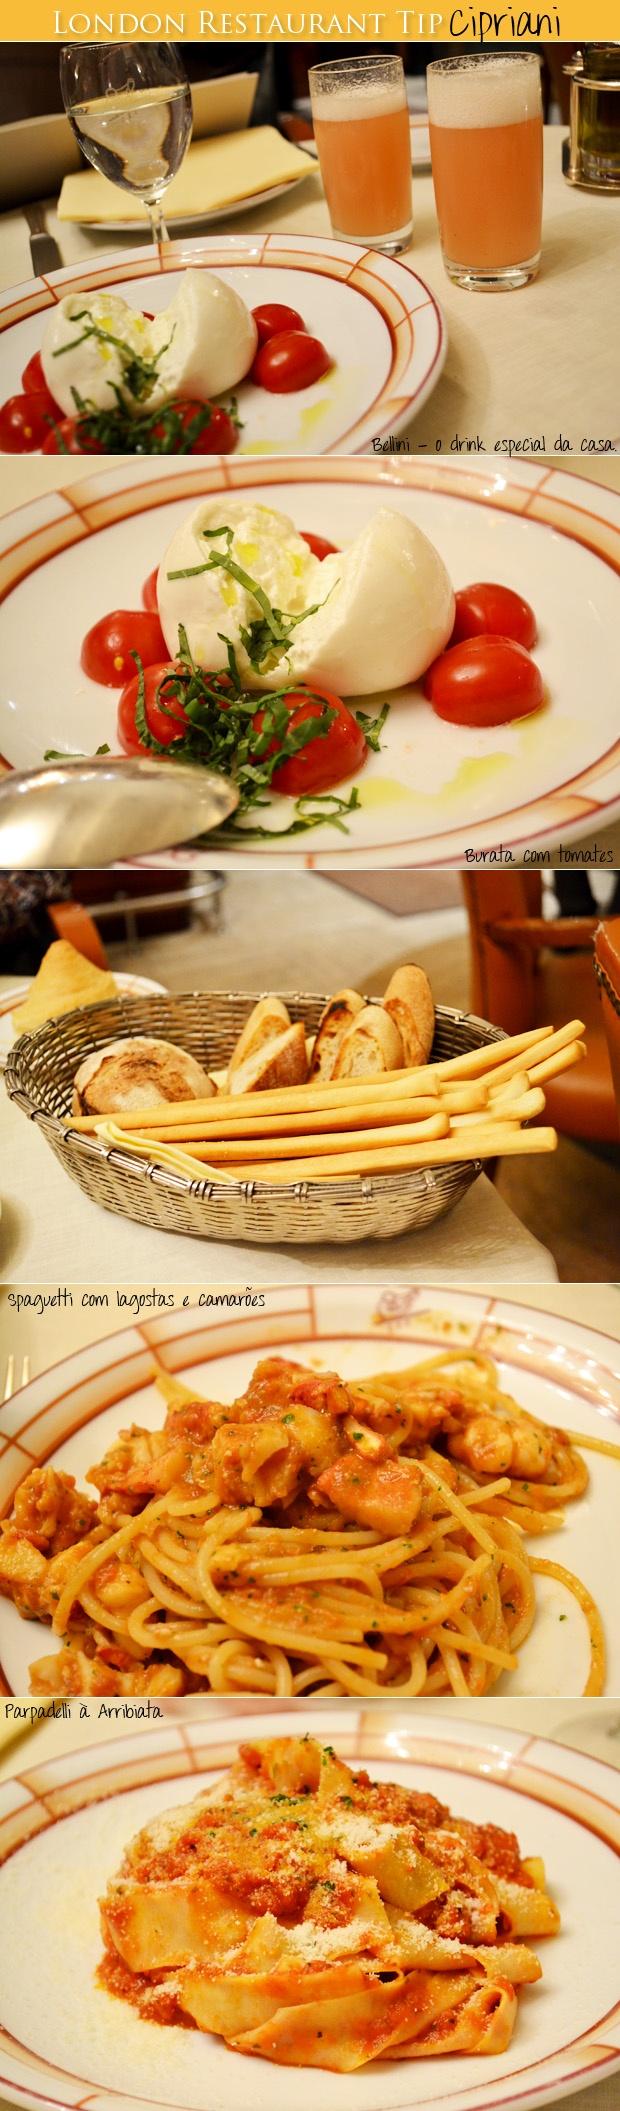 London Restaurant - Cipriani comida italiana 23-25 Davies Street, London W1K 3DE